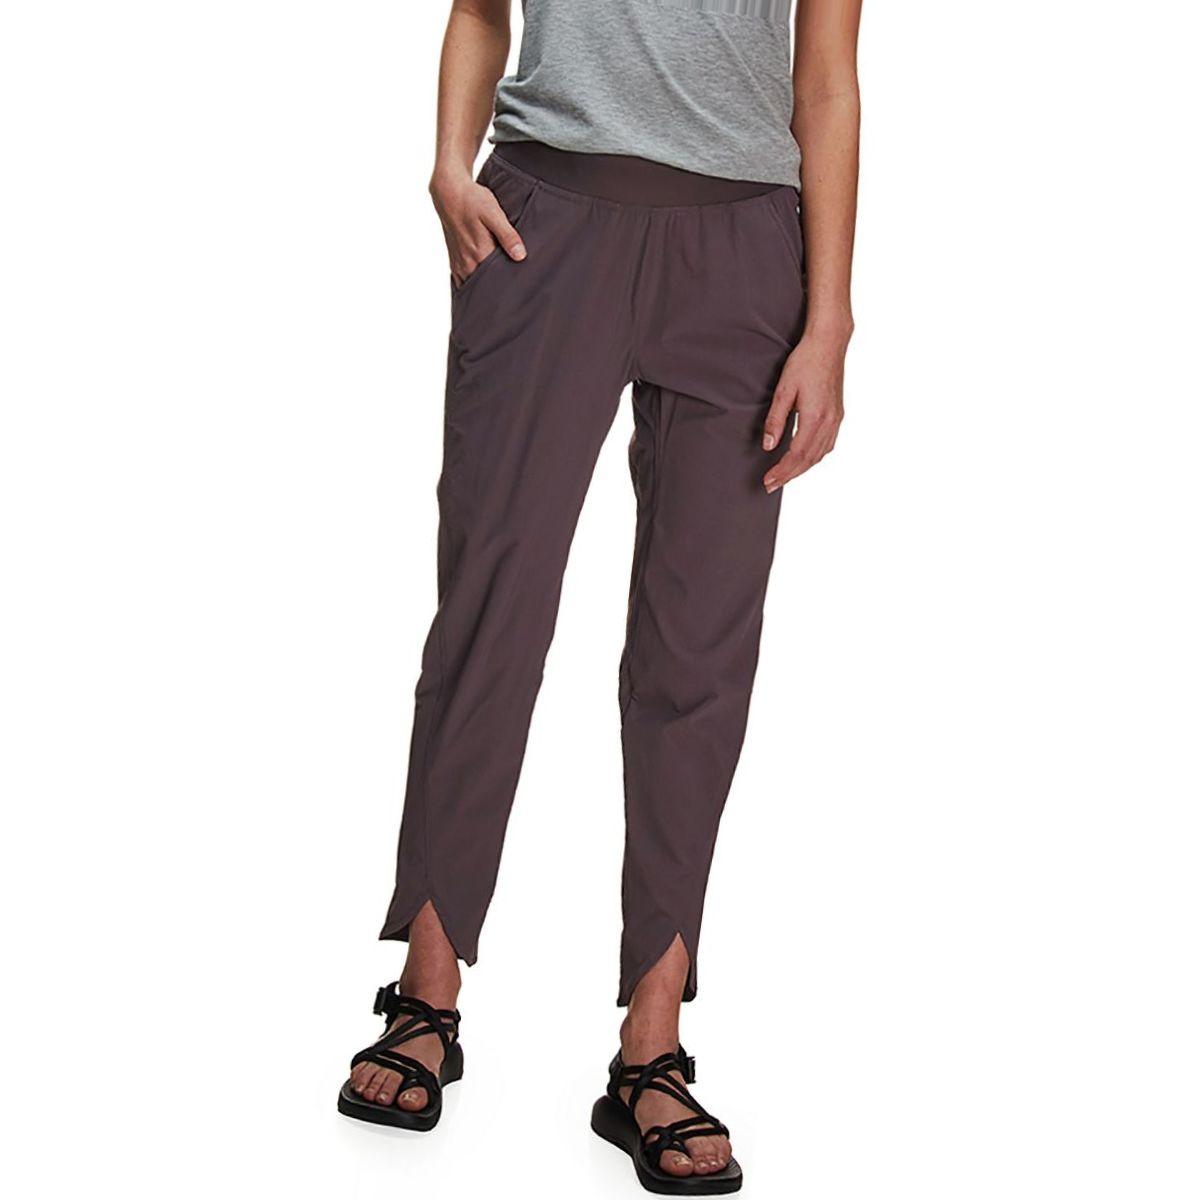 Mountain Hardwear Railay Ankle Pant - Women's